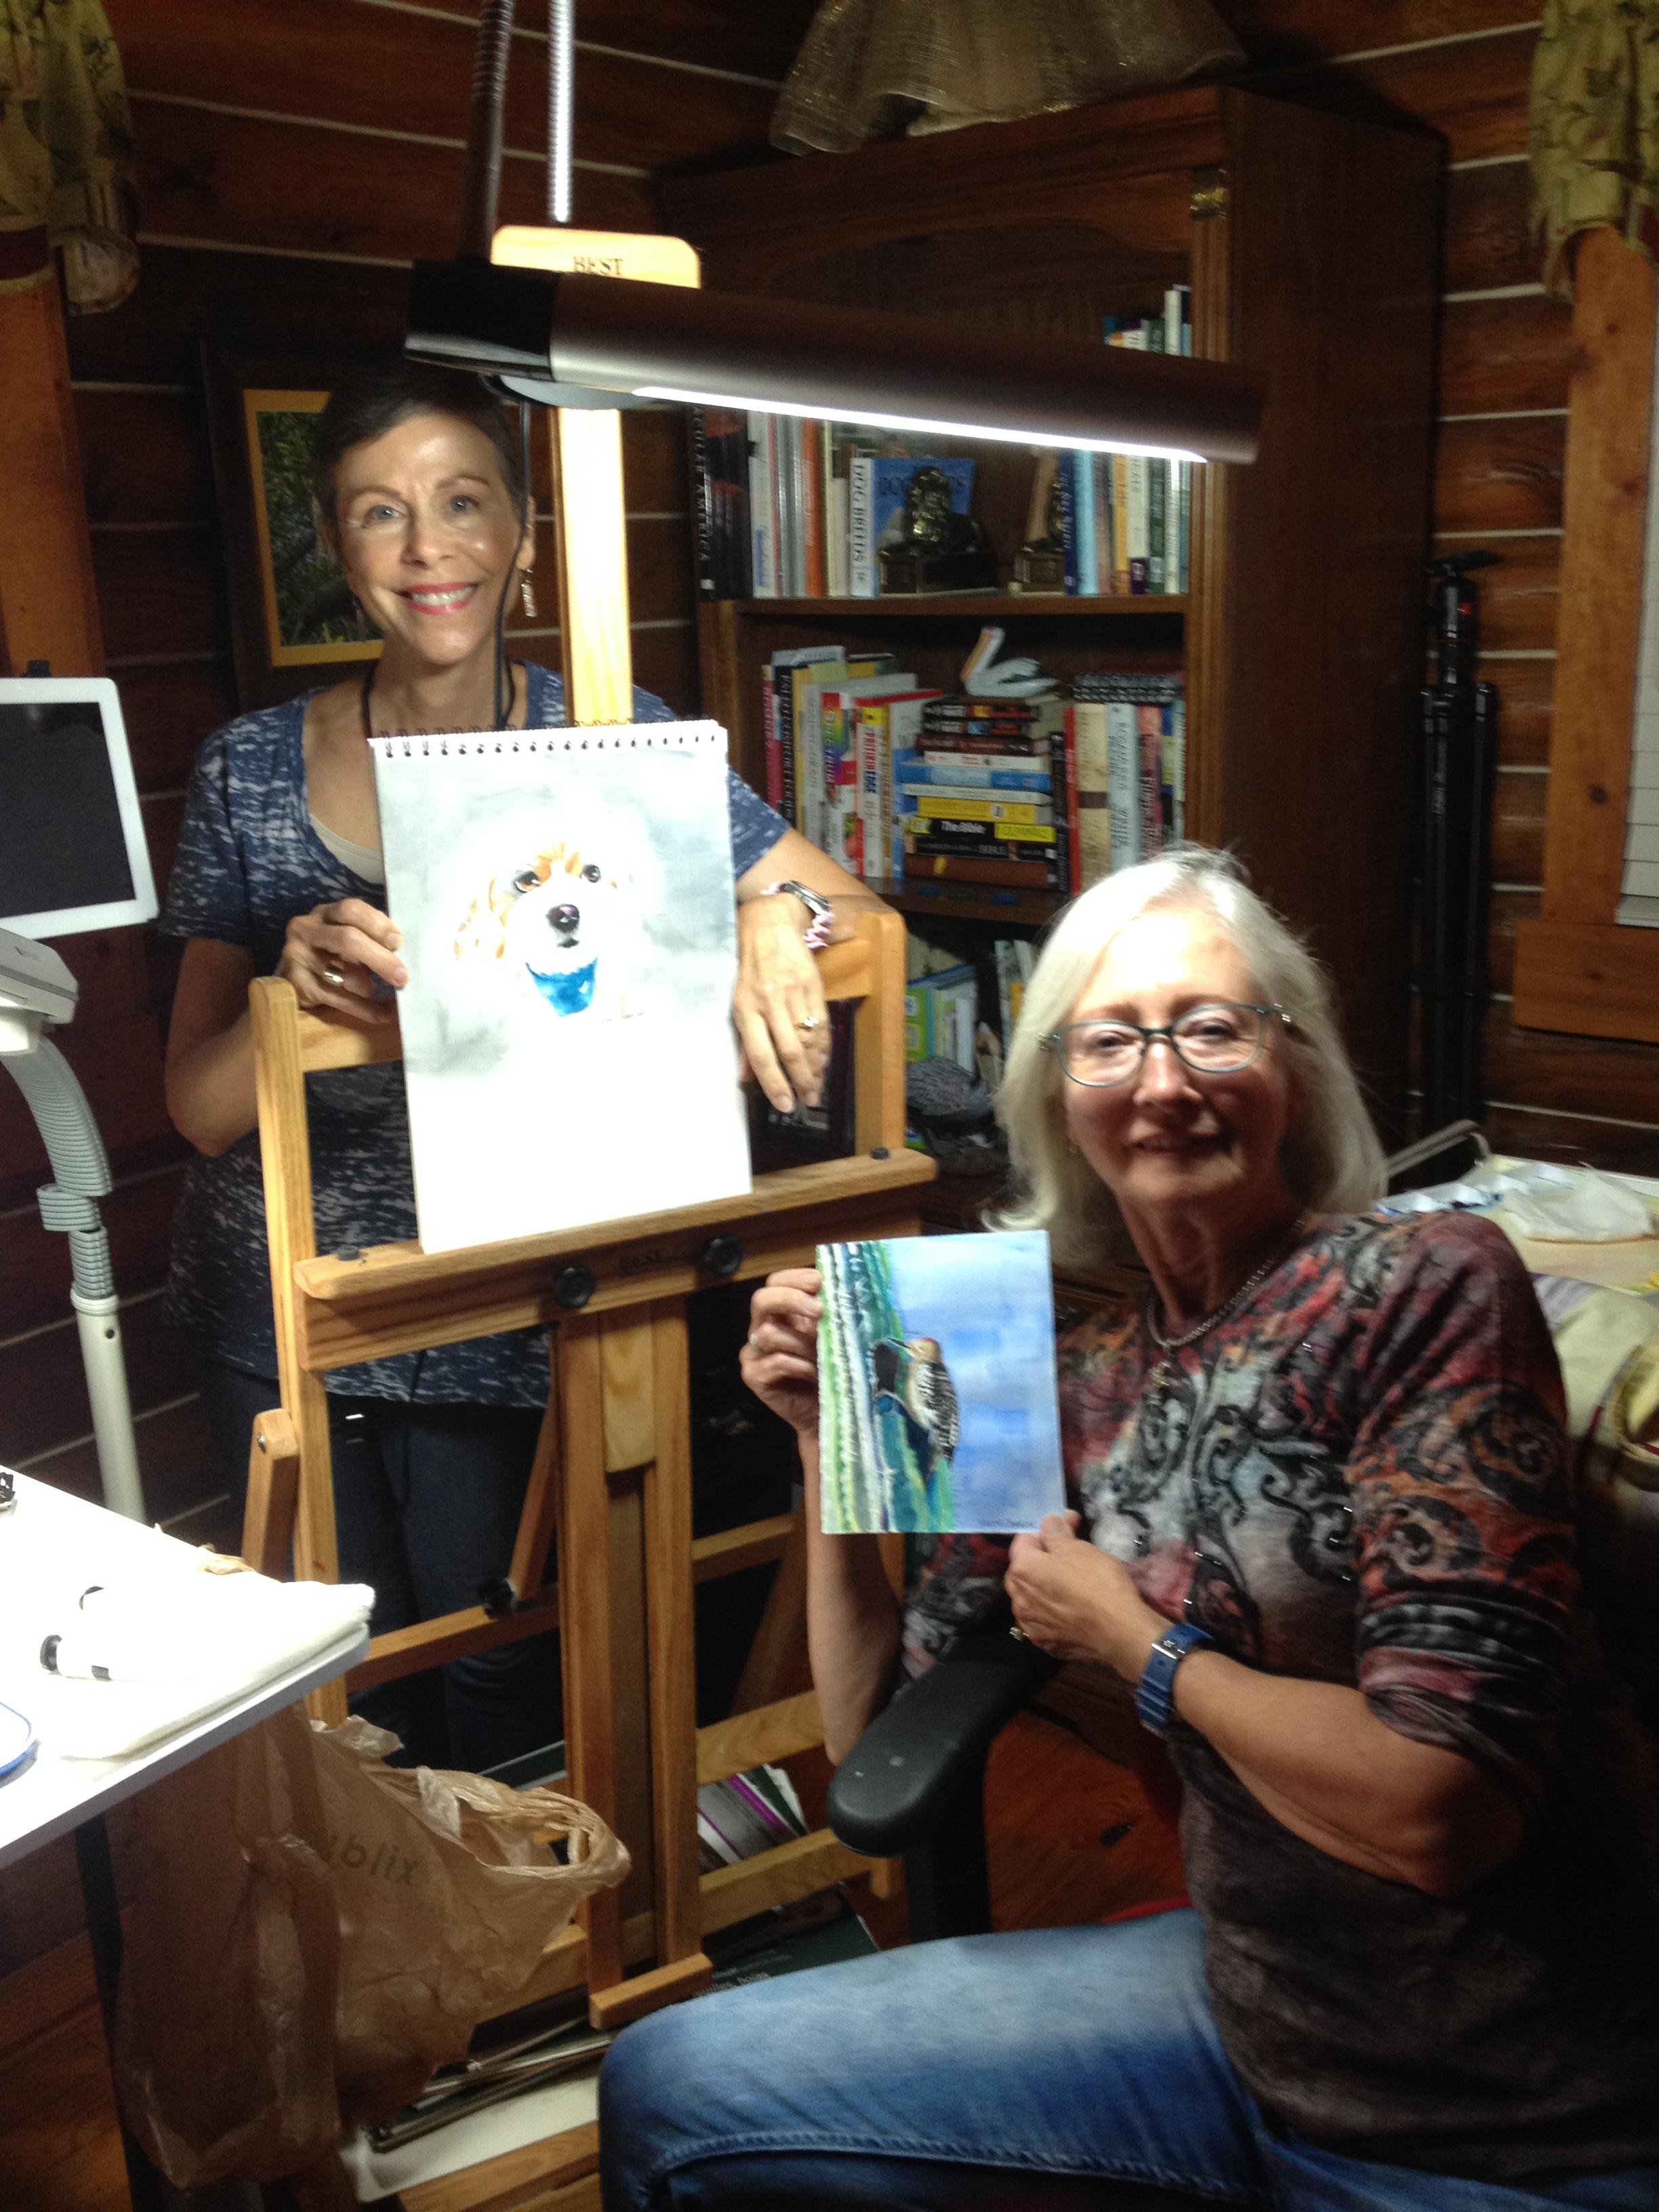 Lynn Ashford and Nancy Johnson at work in the studio